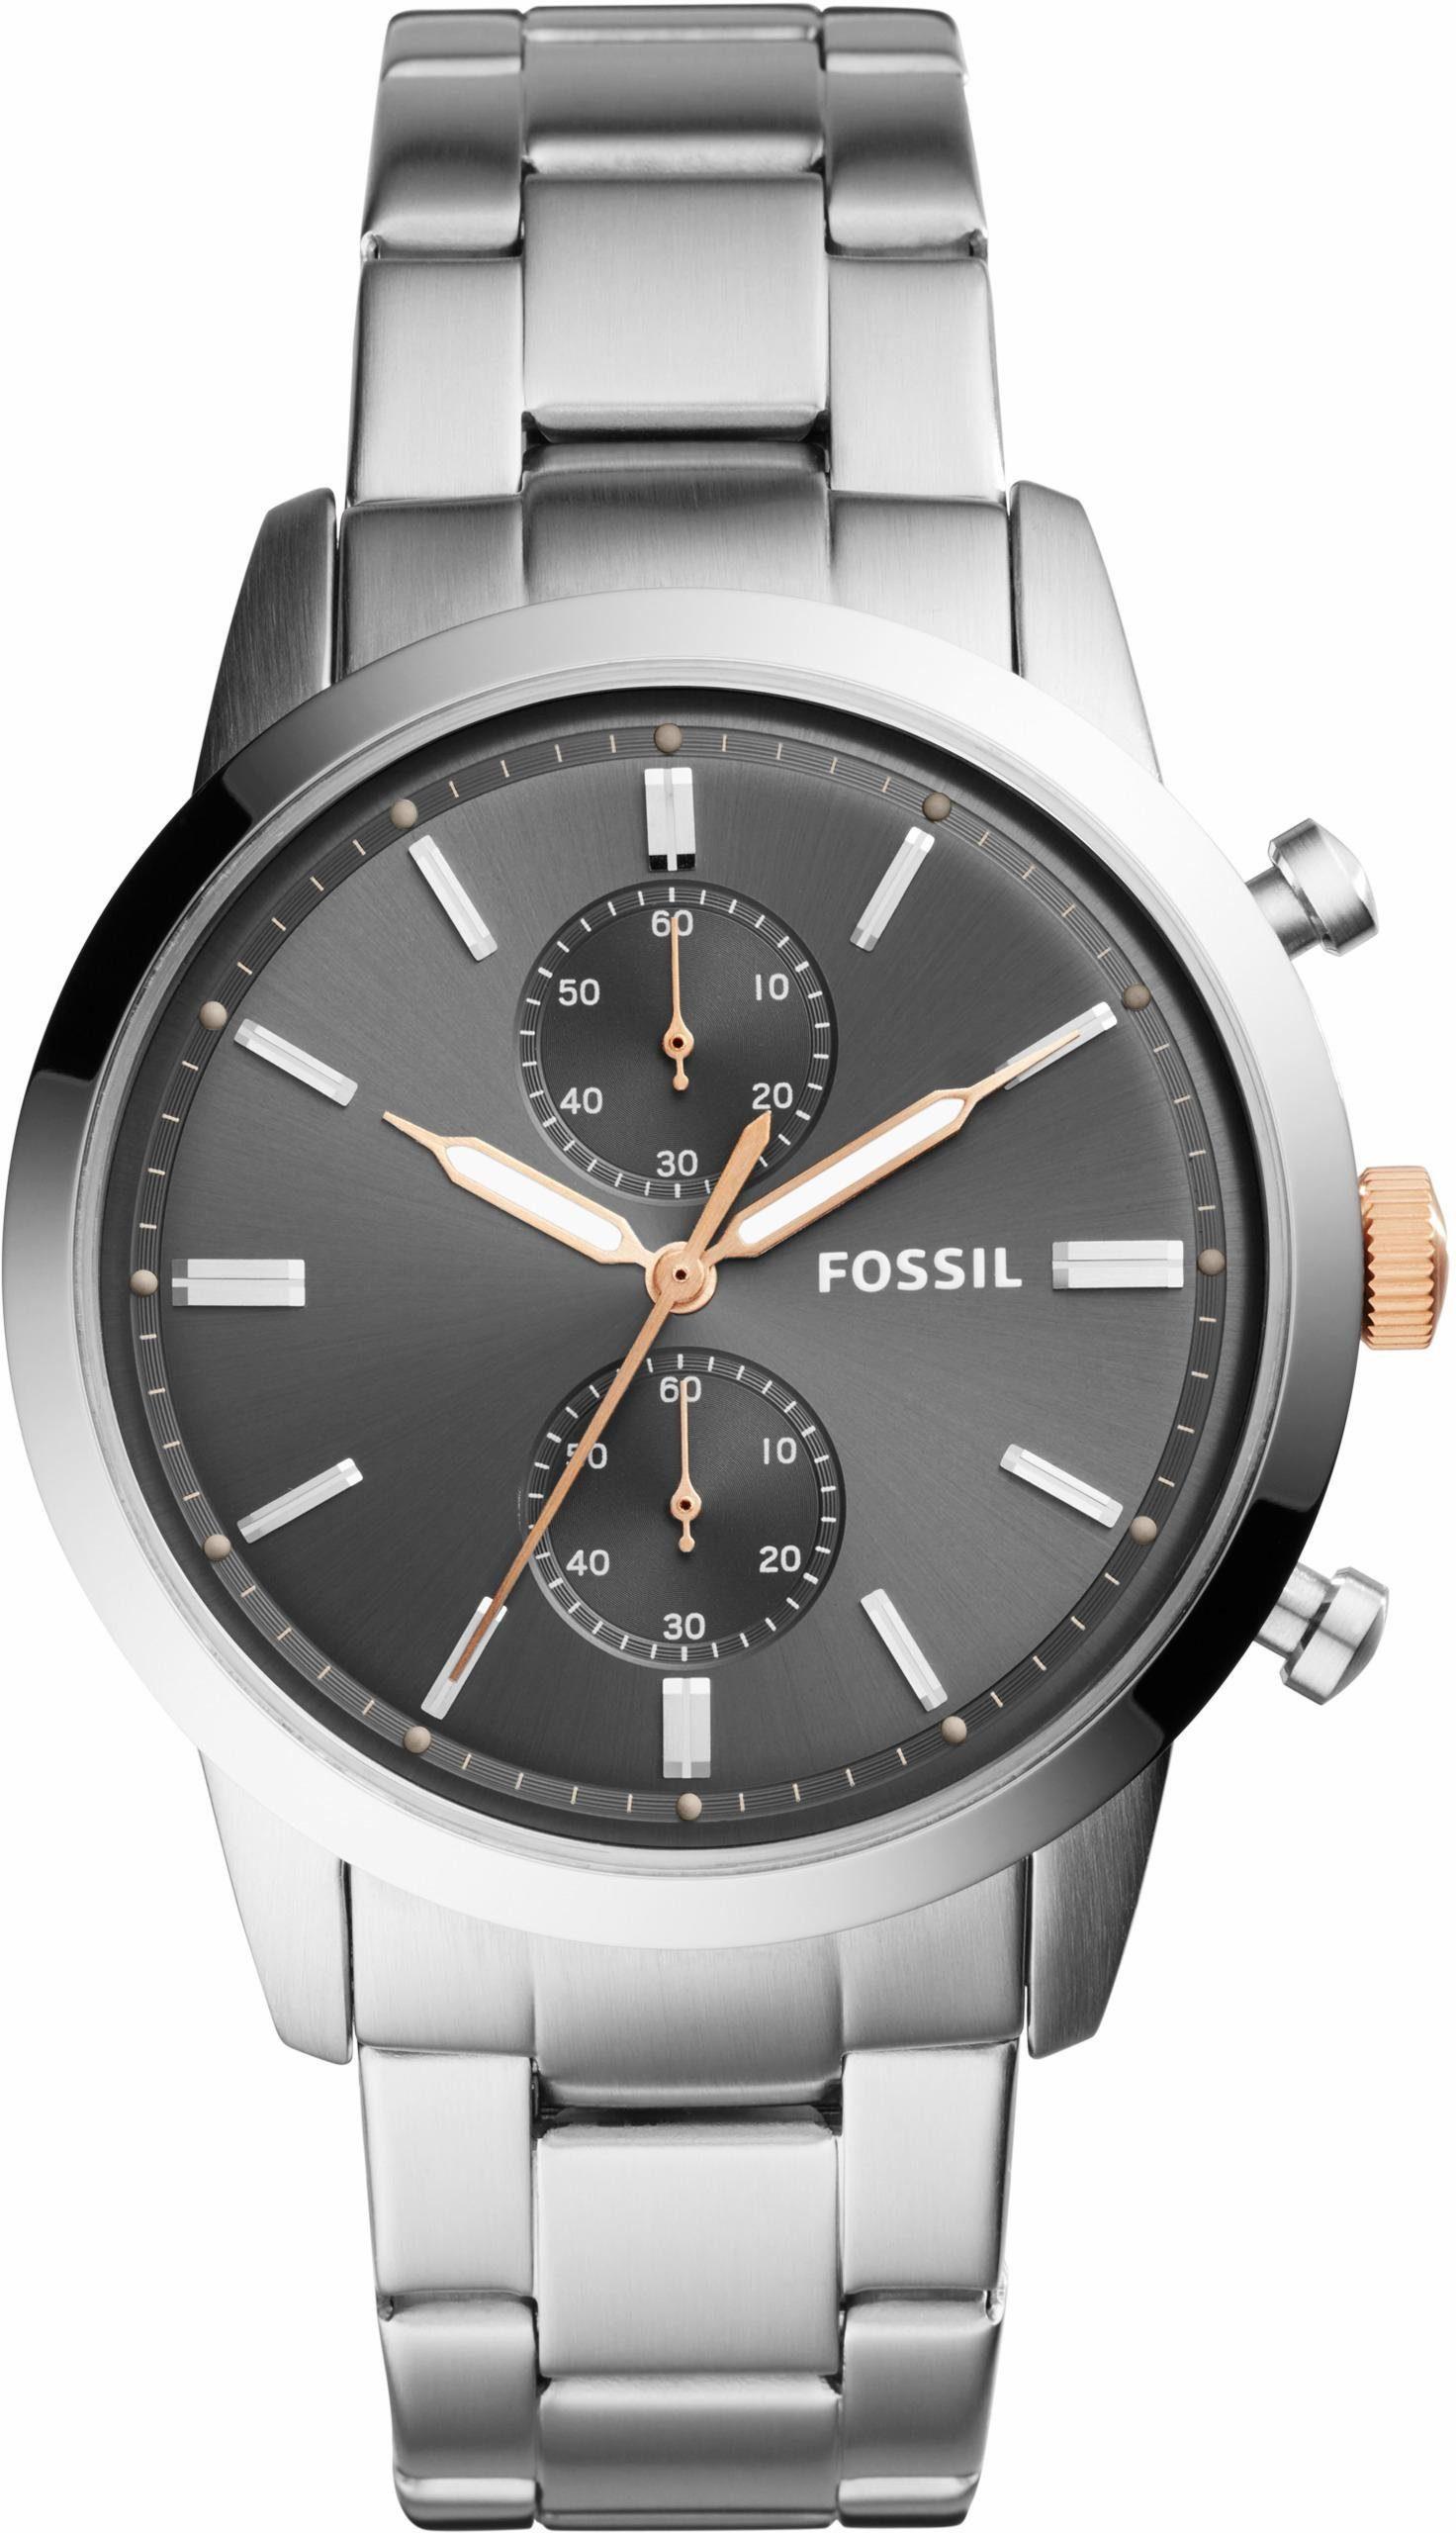 Fossil Chronograph »TOWNSMAN, FS5407«